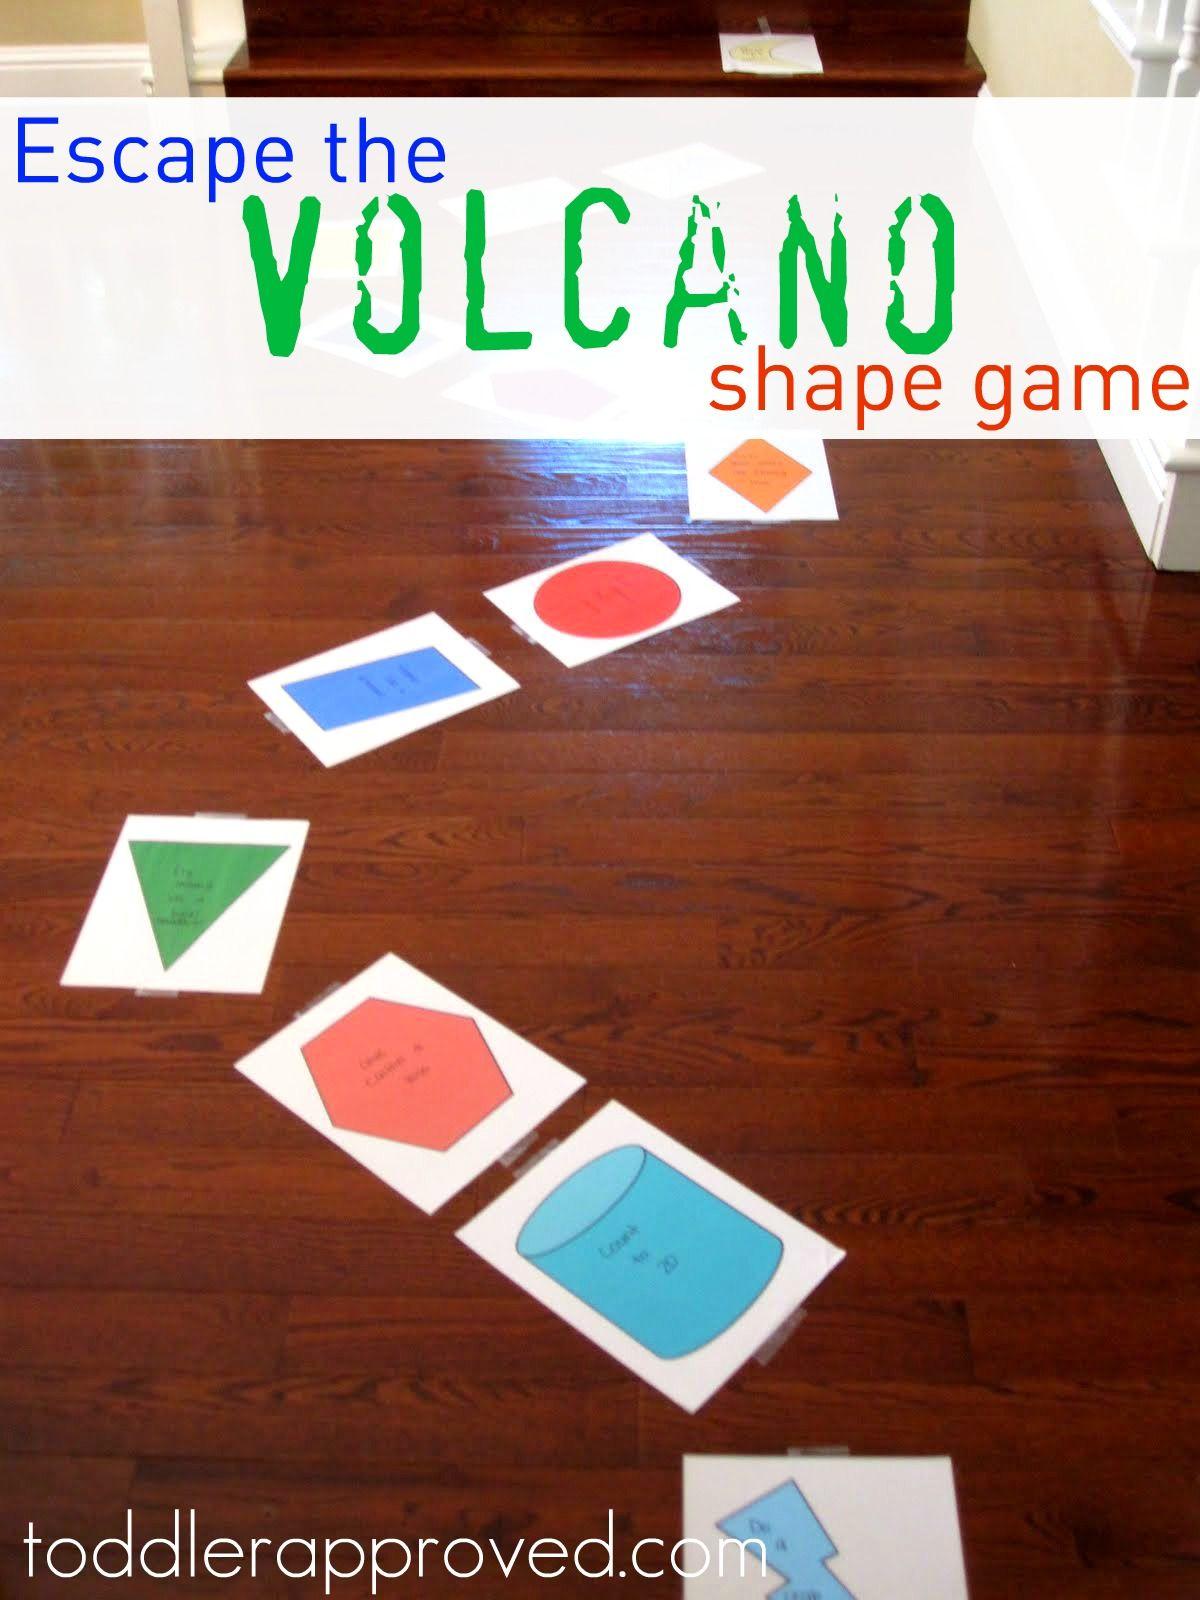 Escape the Volcano Shape Game Shape games, Teaching